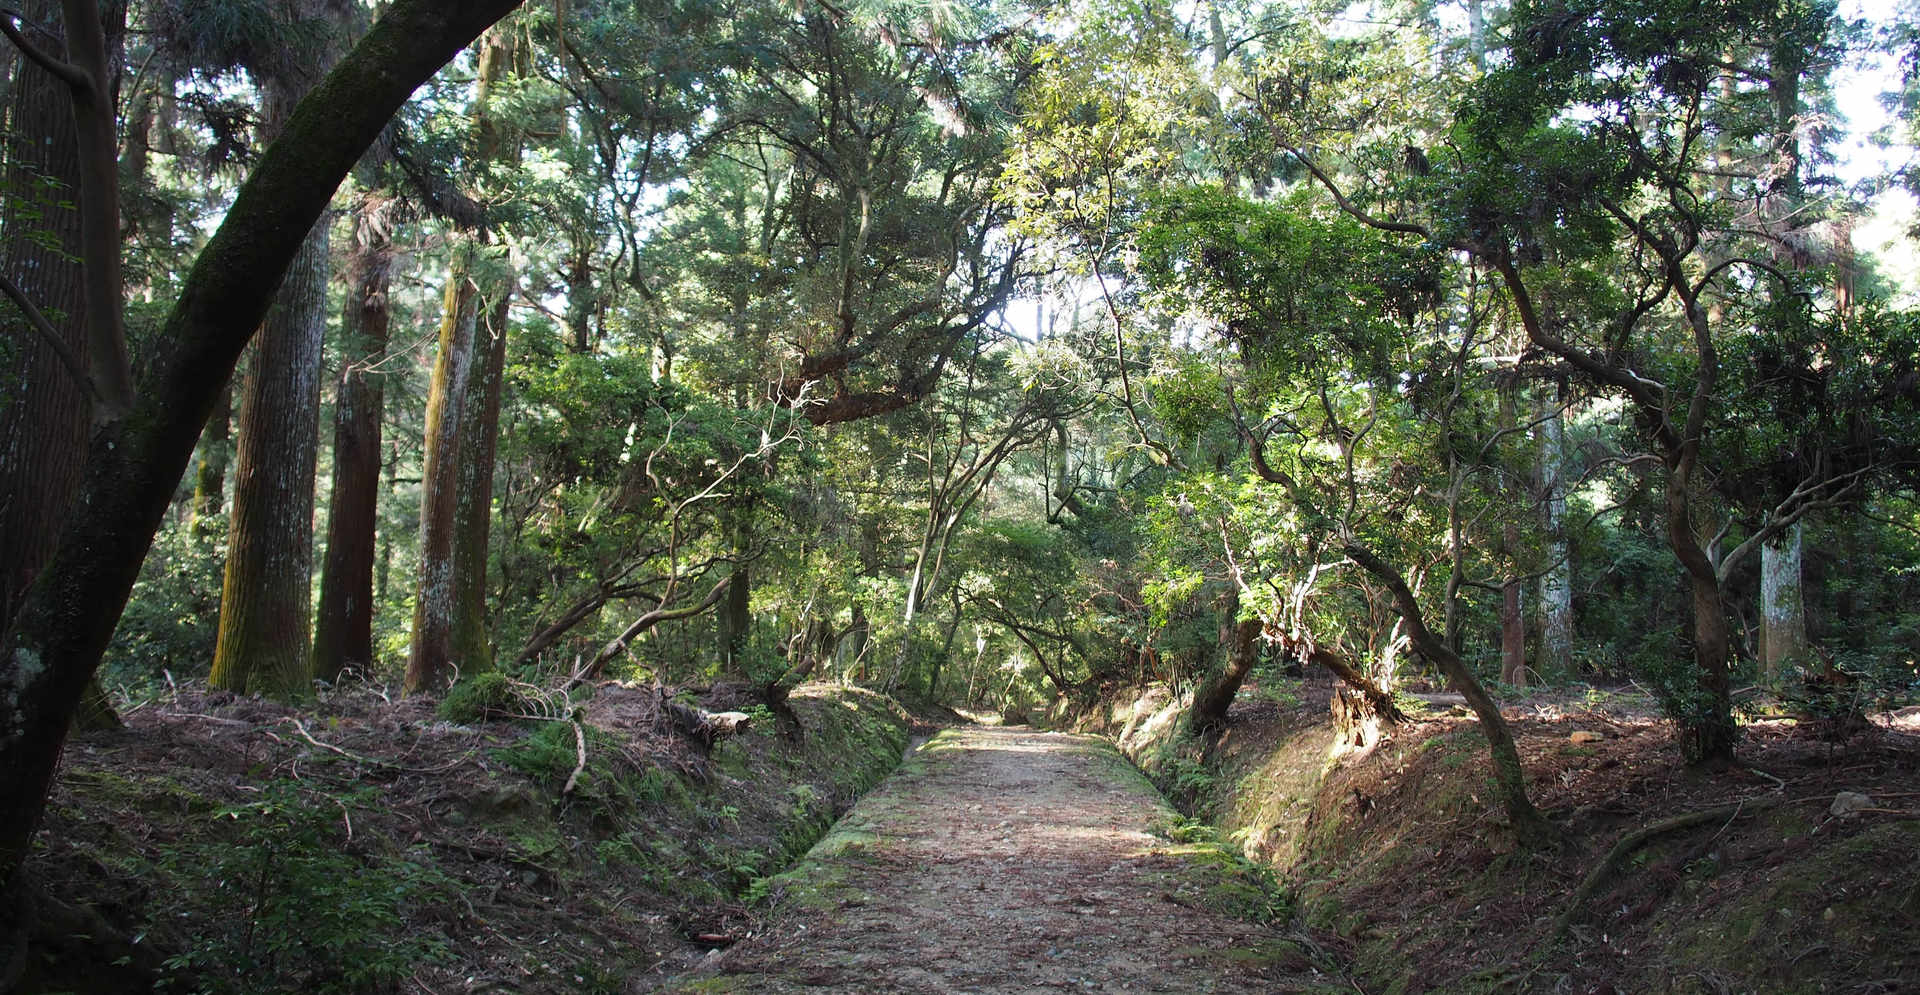 Shrine priests' road /春日大社禰宜道